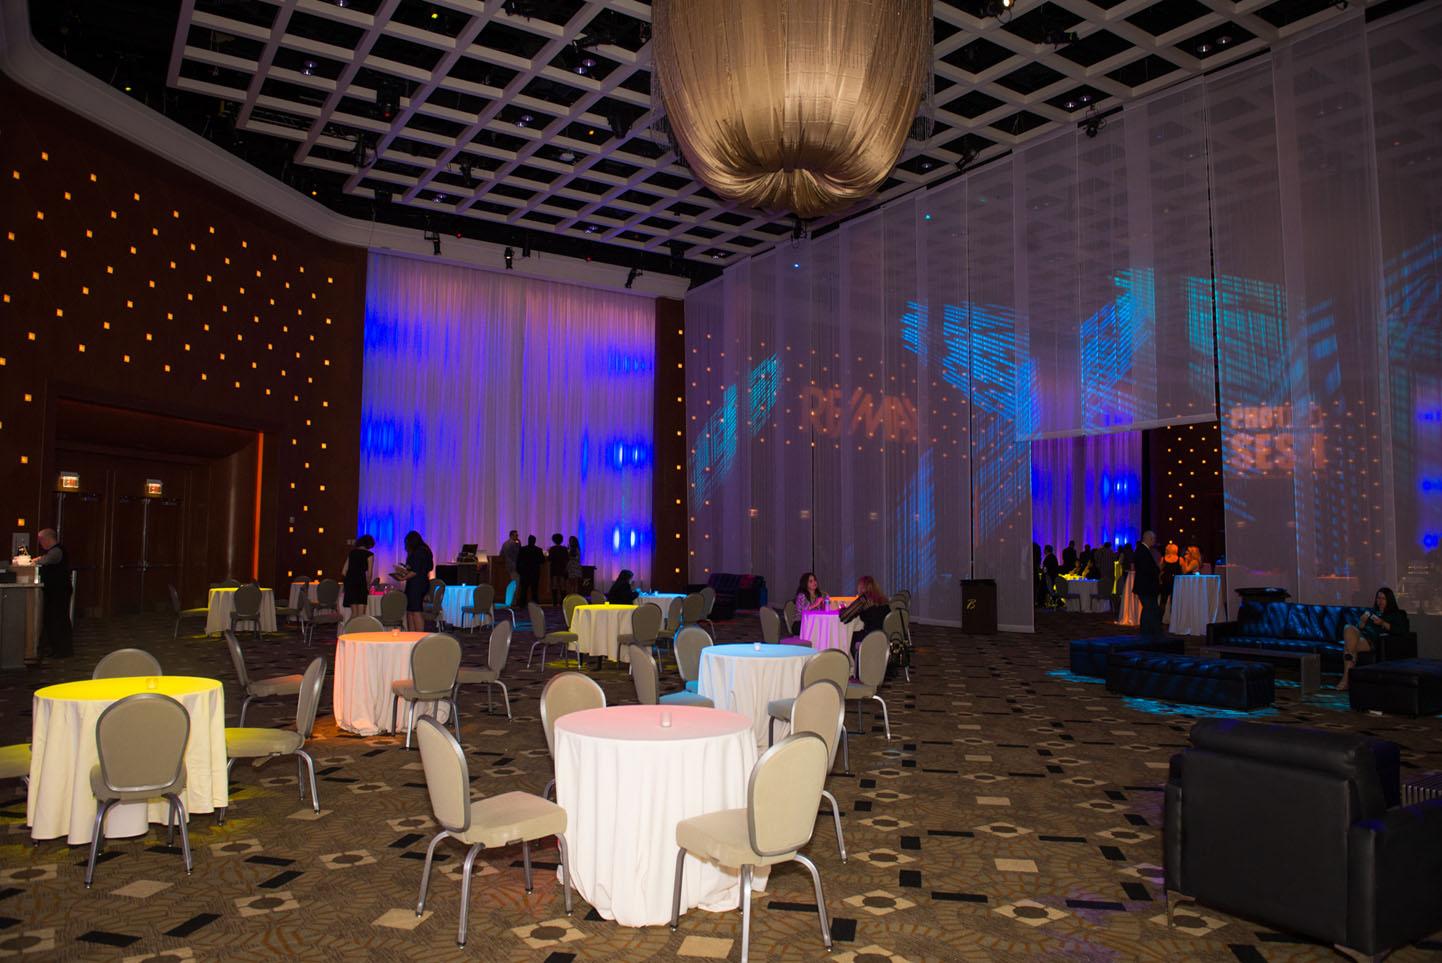 2015-12-09 ReMax Corpoarte Event - The Borgata - Atlantic City NJ - Photo Sesh - 2015-5037.jpg